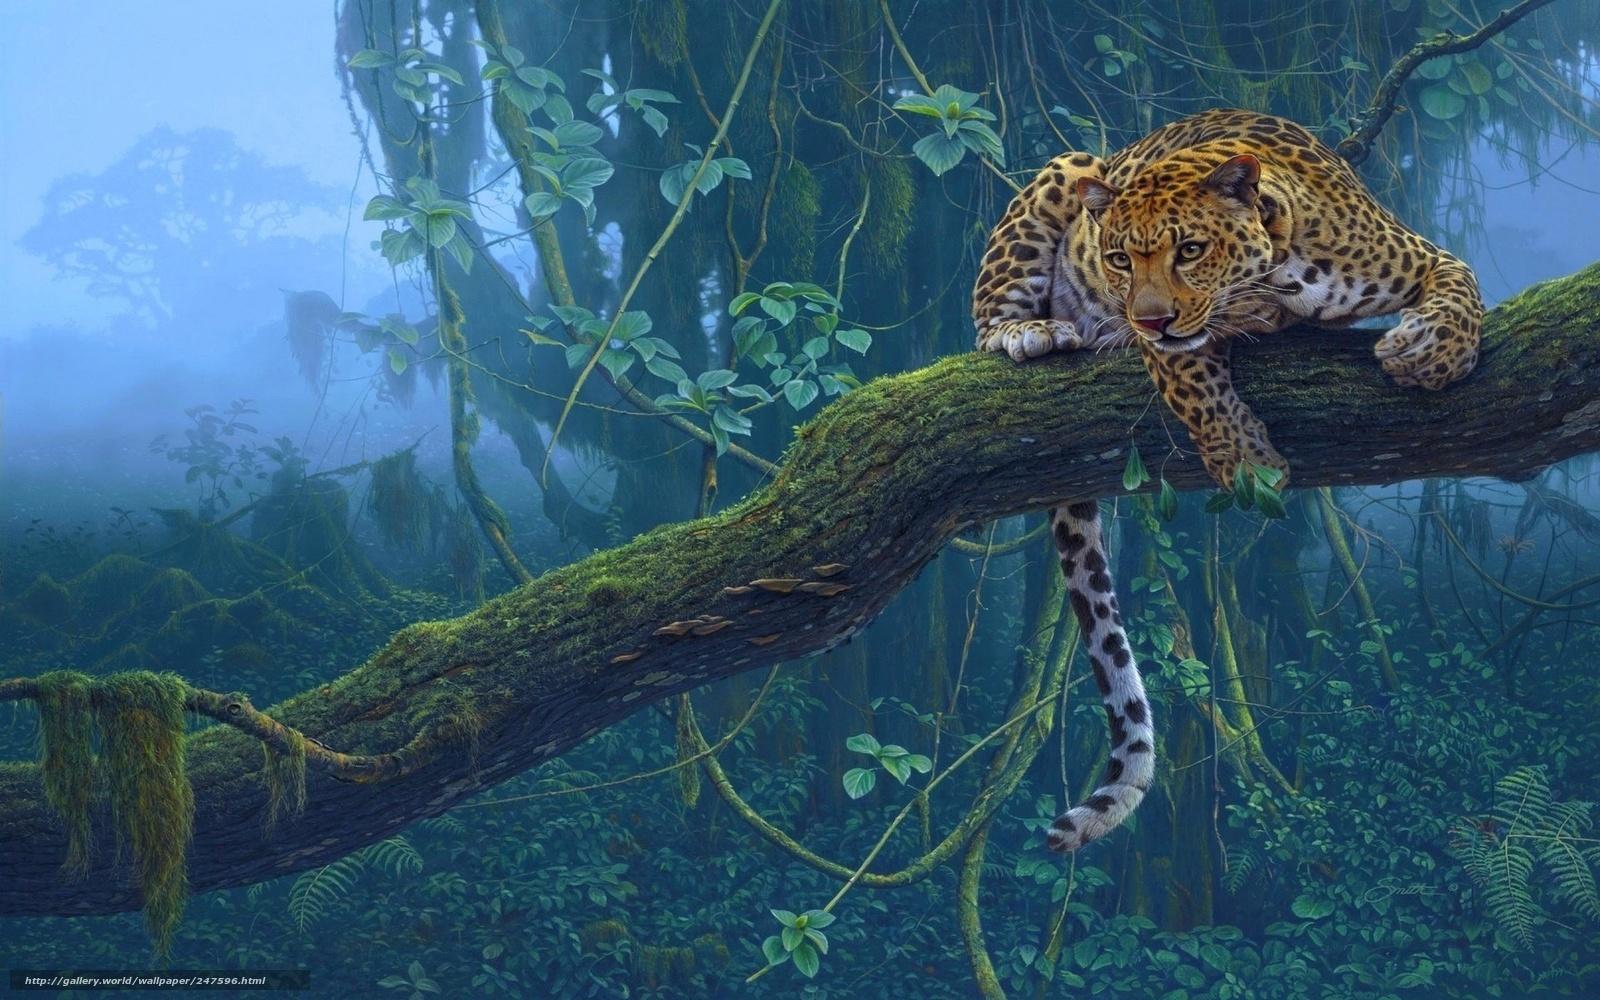 >> IMAGENES ENCADENADAS << - Página 3 247596_leopard_-dzhungli_-derevo_-vetka_1920x1200_%28www.GdeFon.ru%29